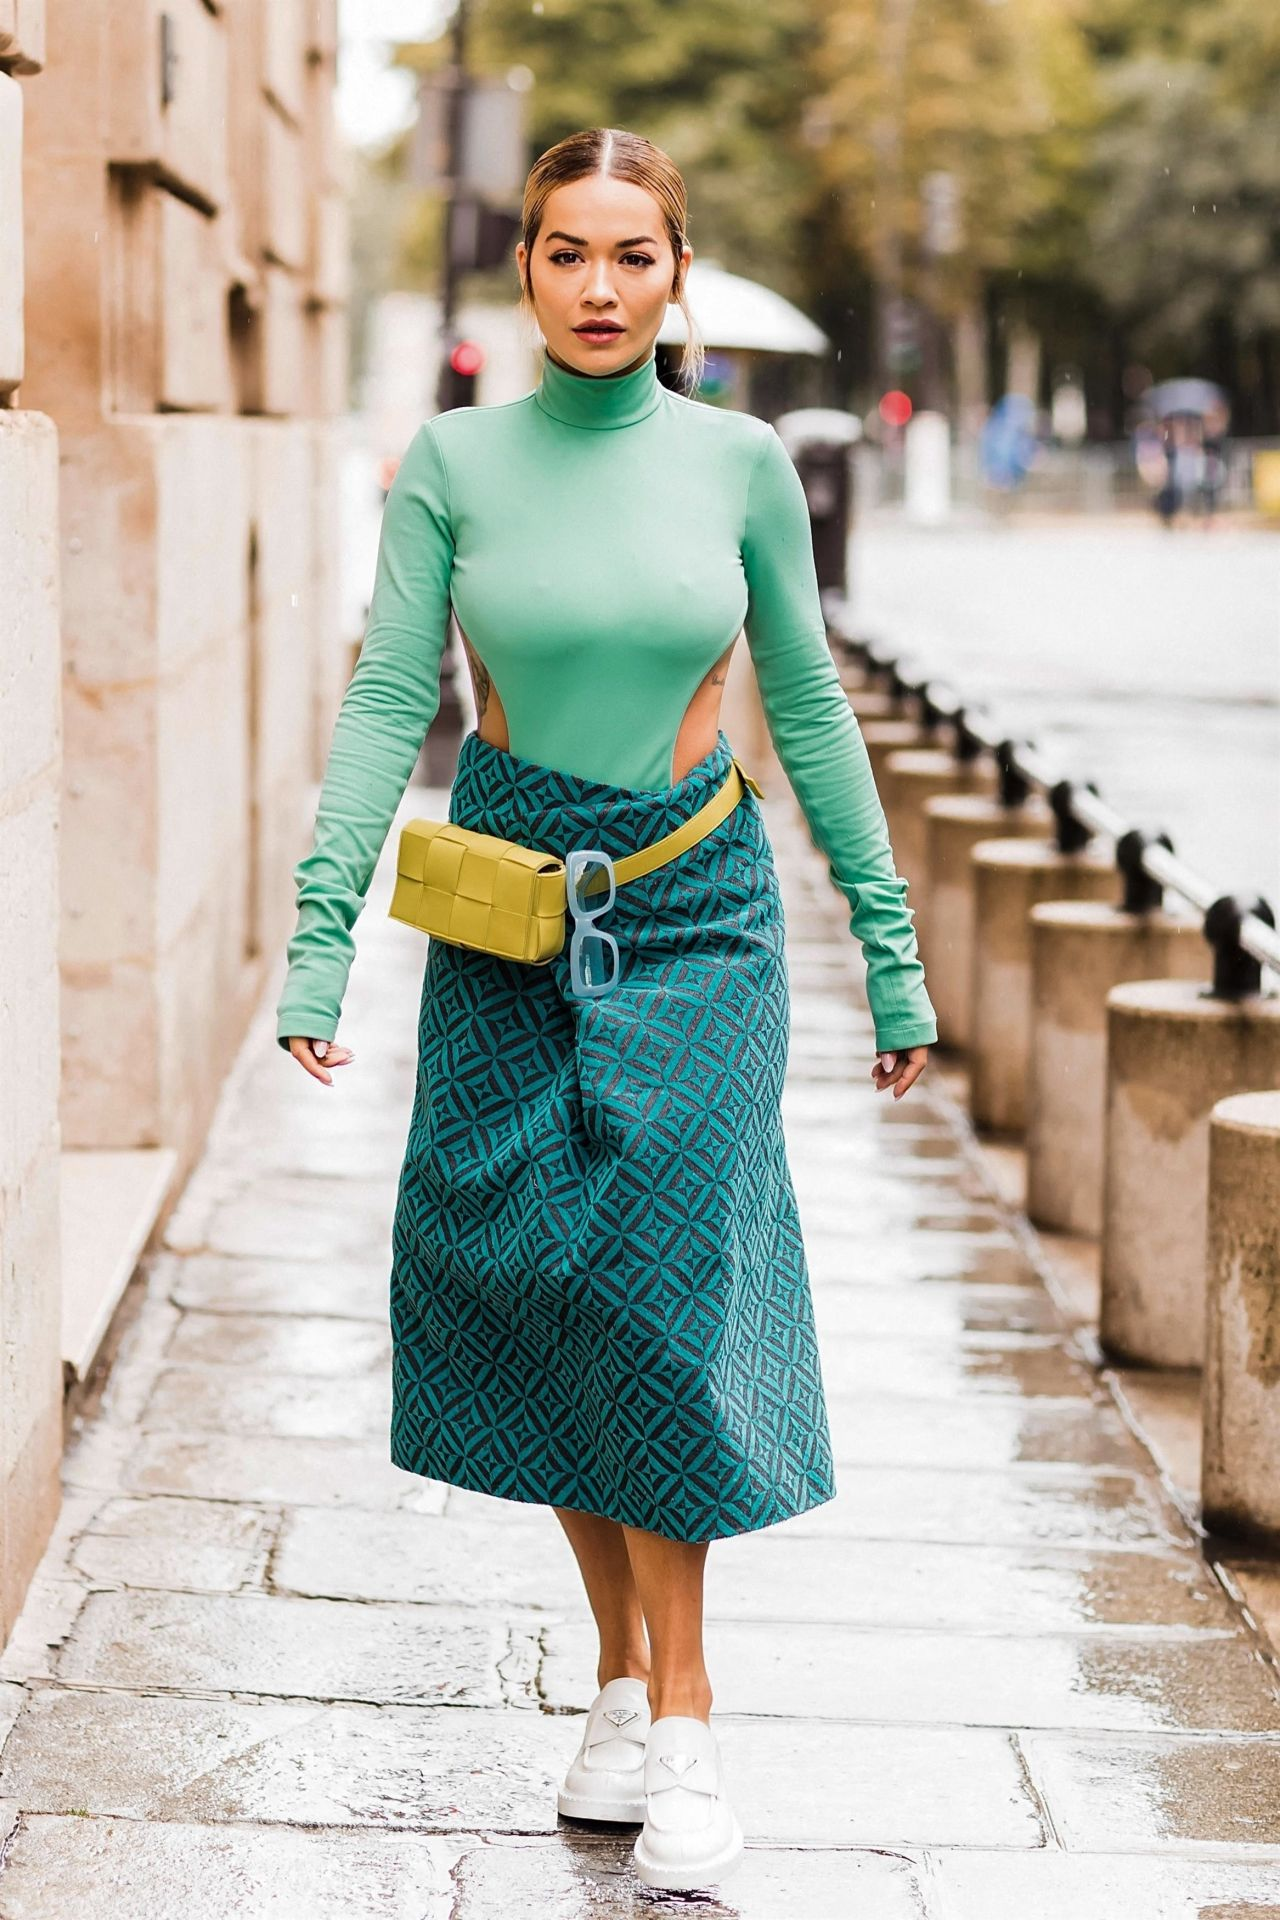 rita-ora-wears-marc-jacobs-out-in-paris-august-9-2021